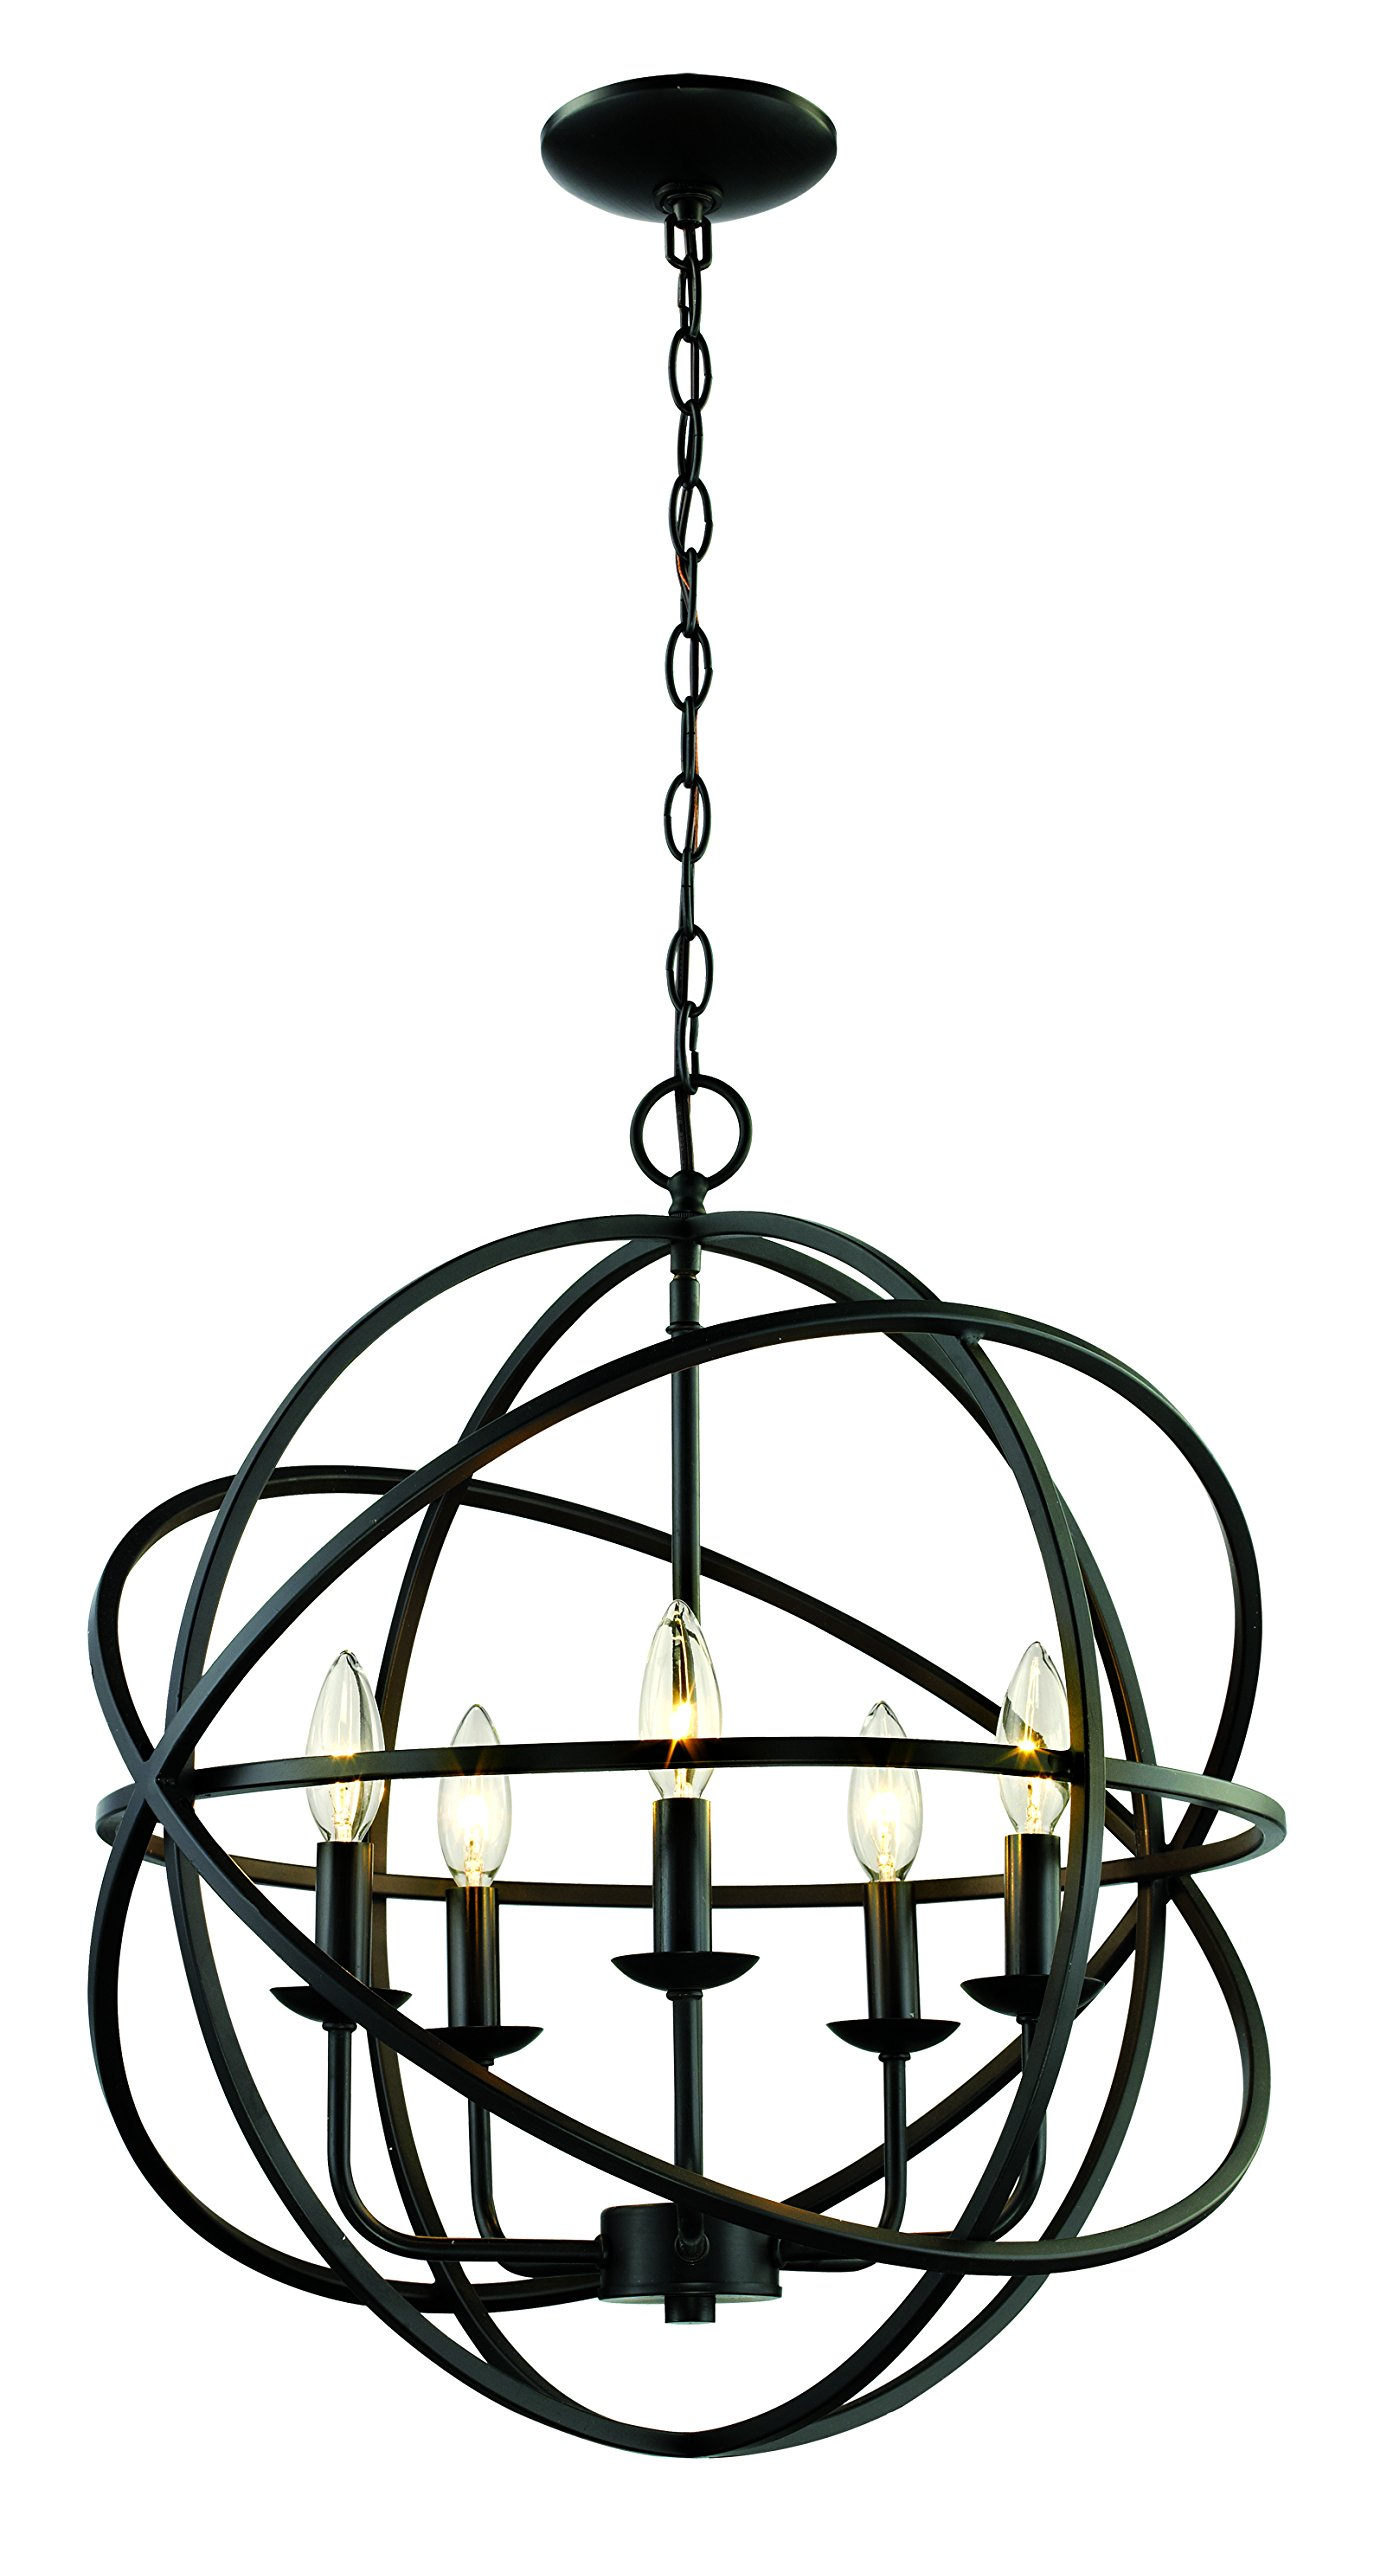 Trans Globe Lighting 70655 ROB Indoor Apollo 20'' Pendant, Rubbed Oil Bronze